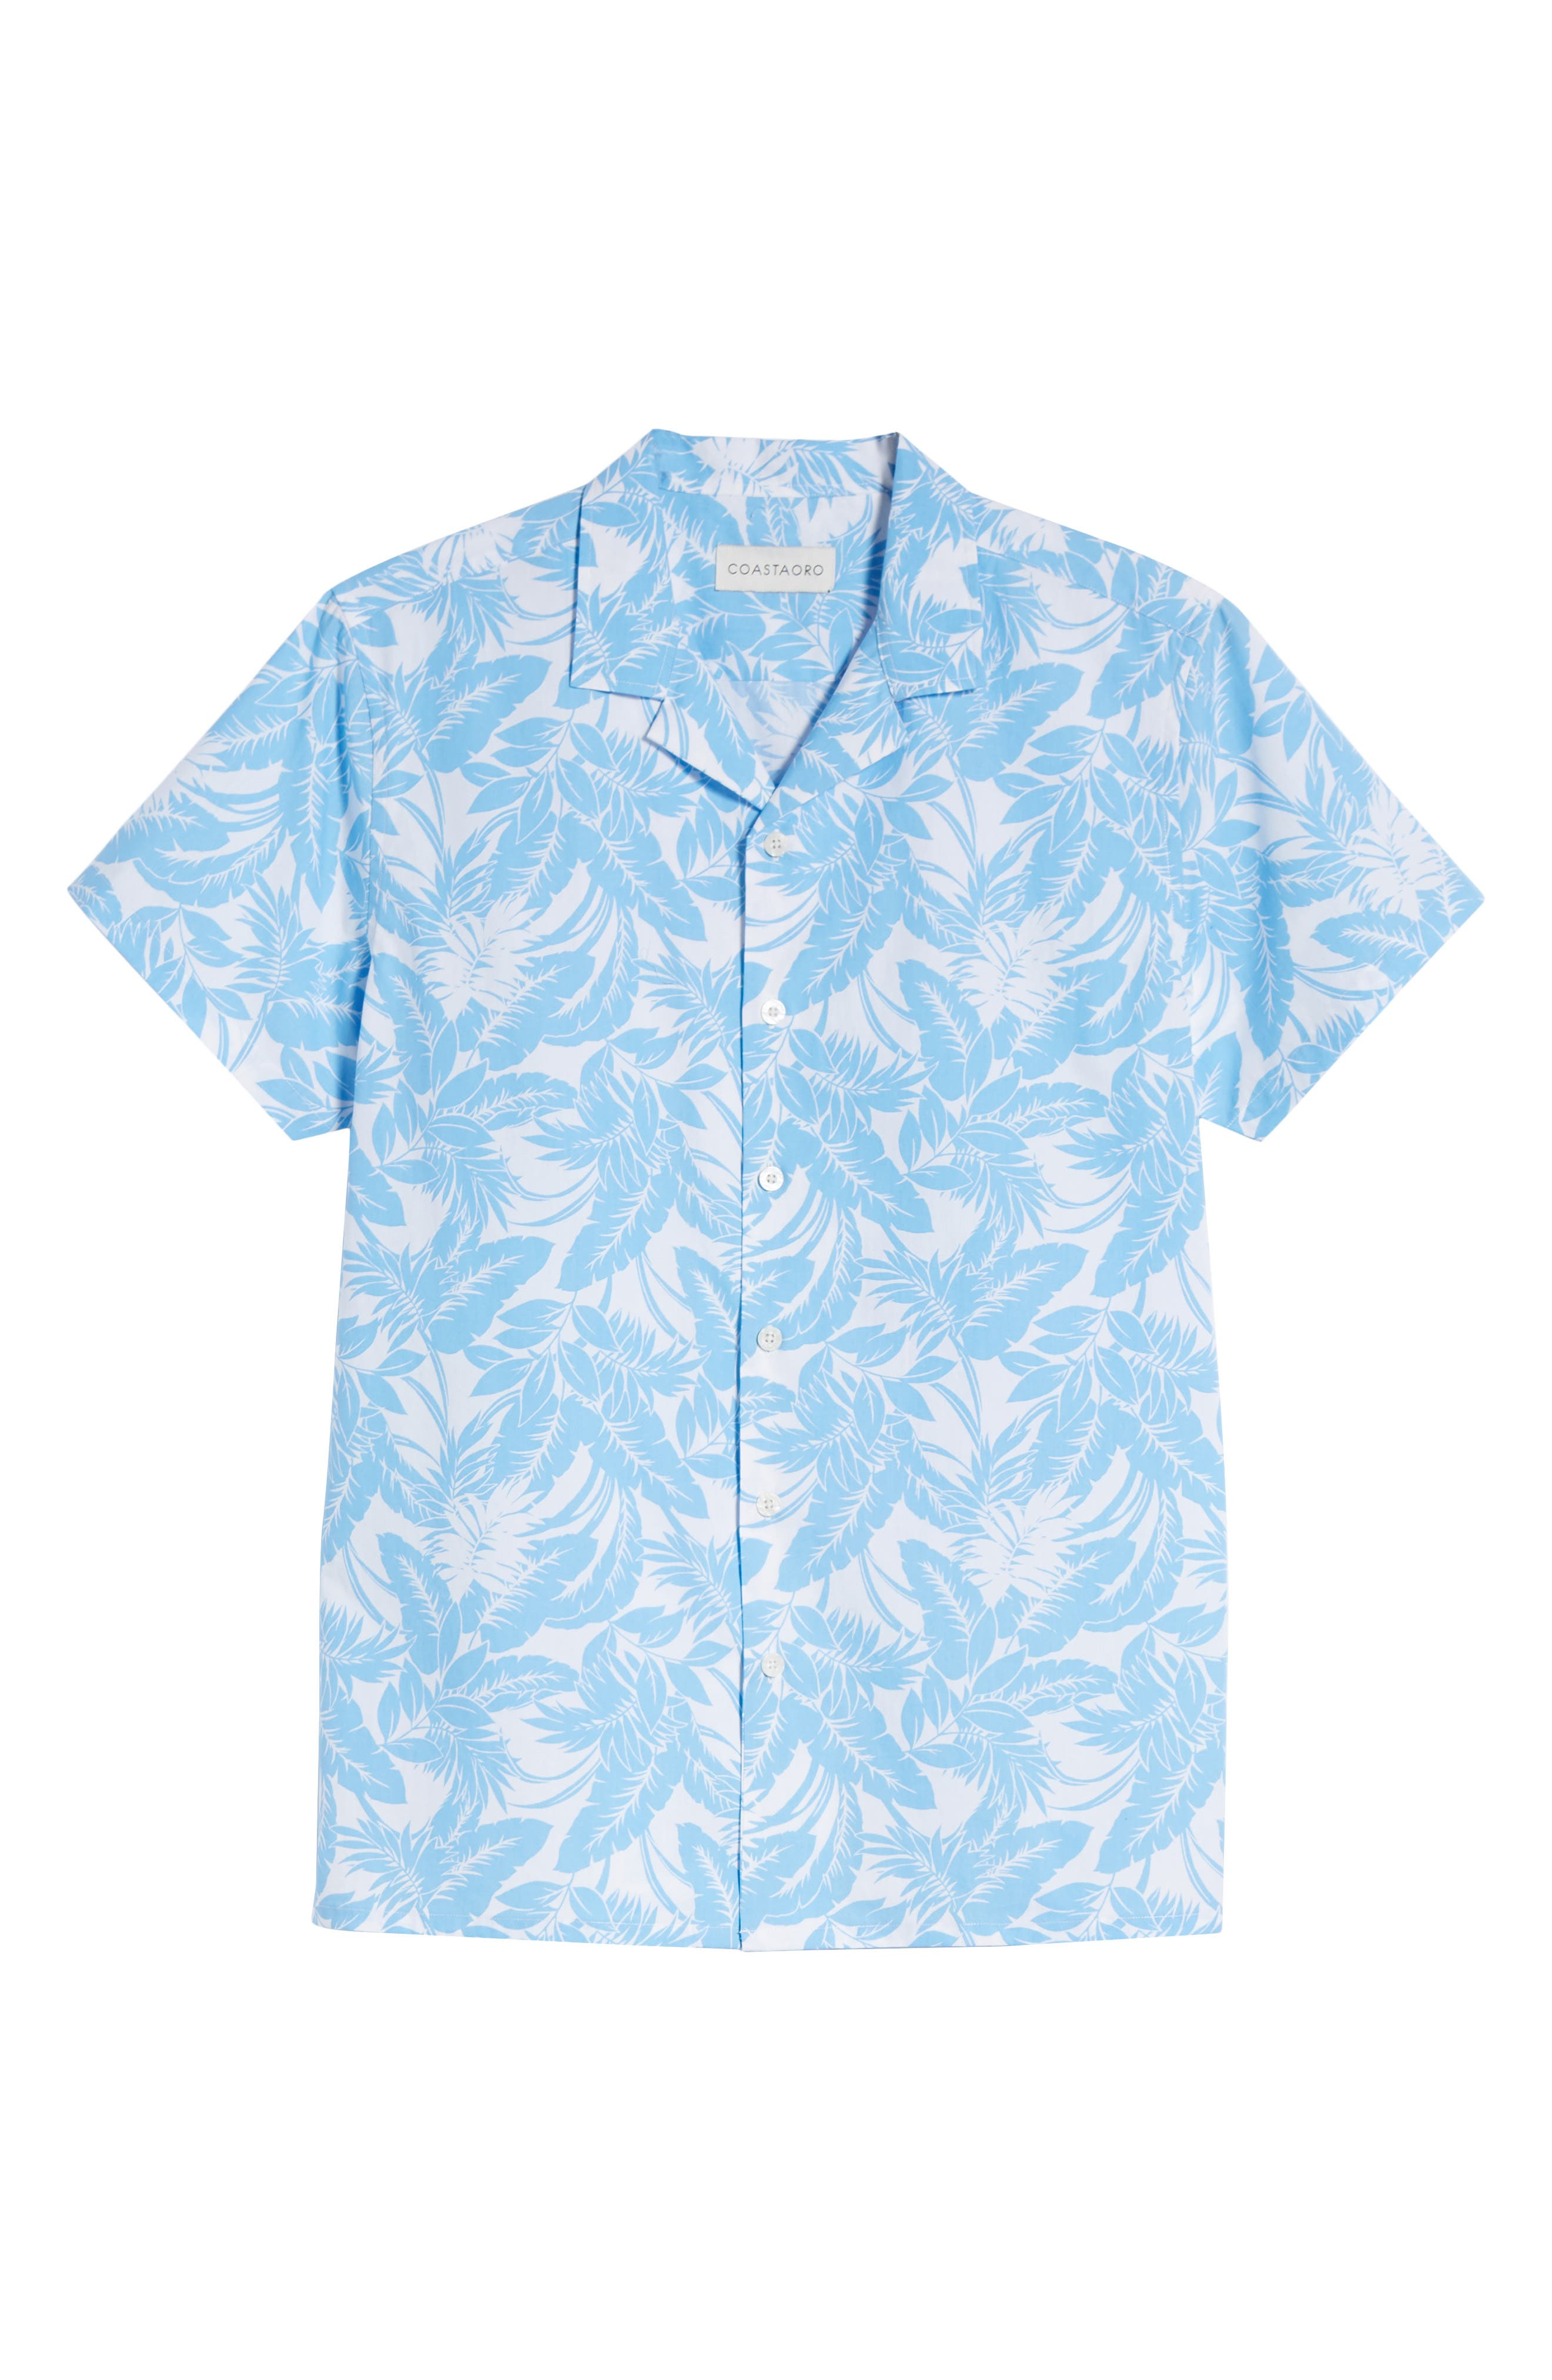 Camp Ventu Regular Fit Short Sleeve Sport Shirt,                             Alternate thumbnail 6, color,                             Sky